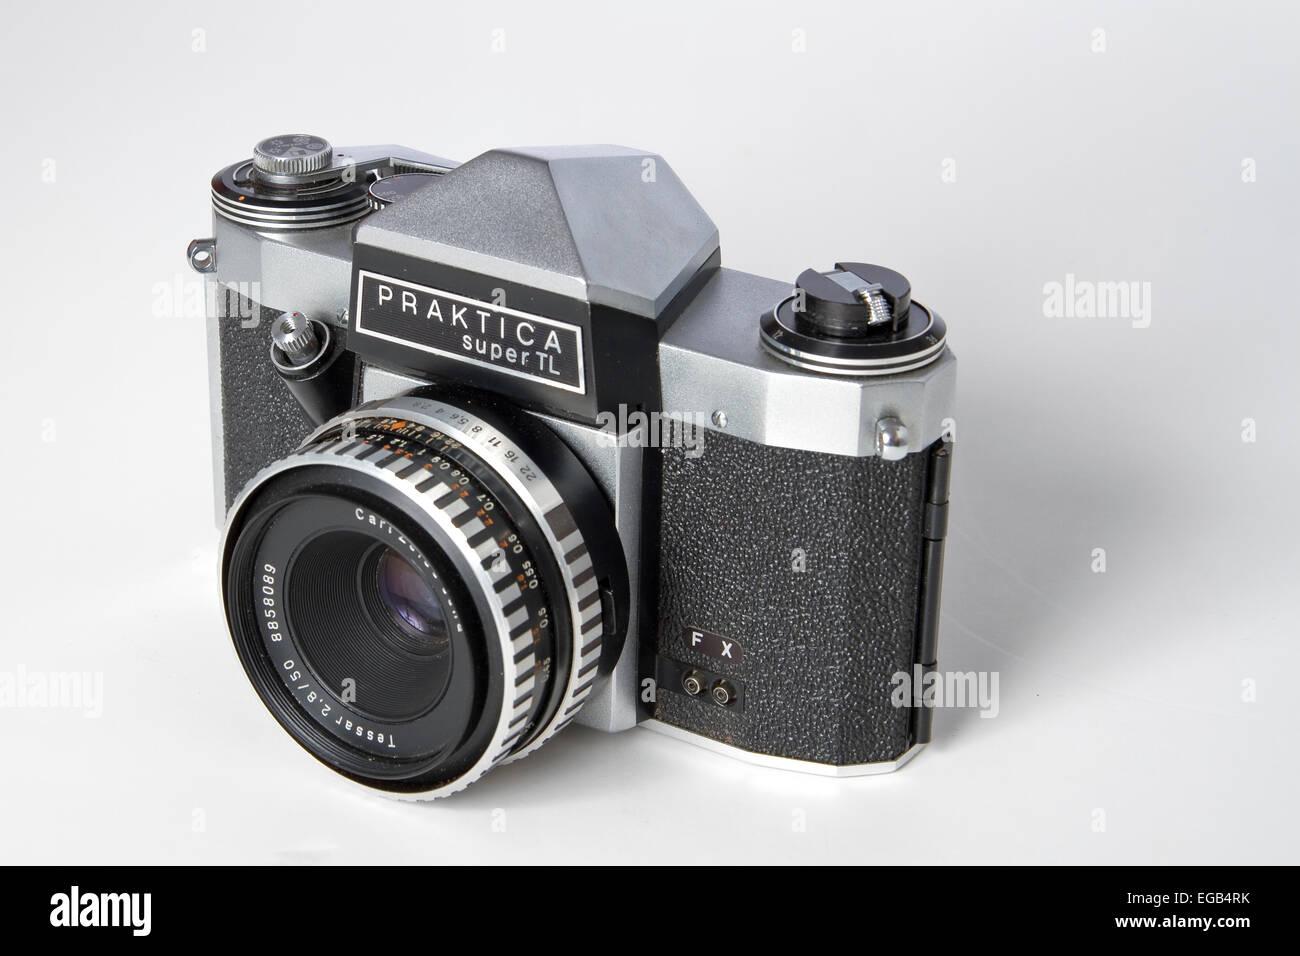 Praktica super tl 35mm slr kamera vintage kamera stockfoto bild